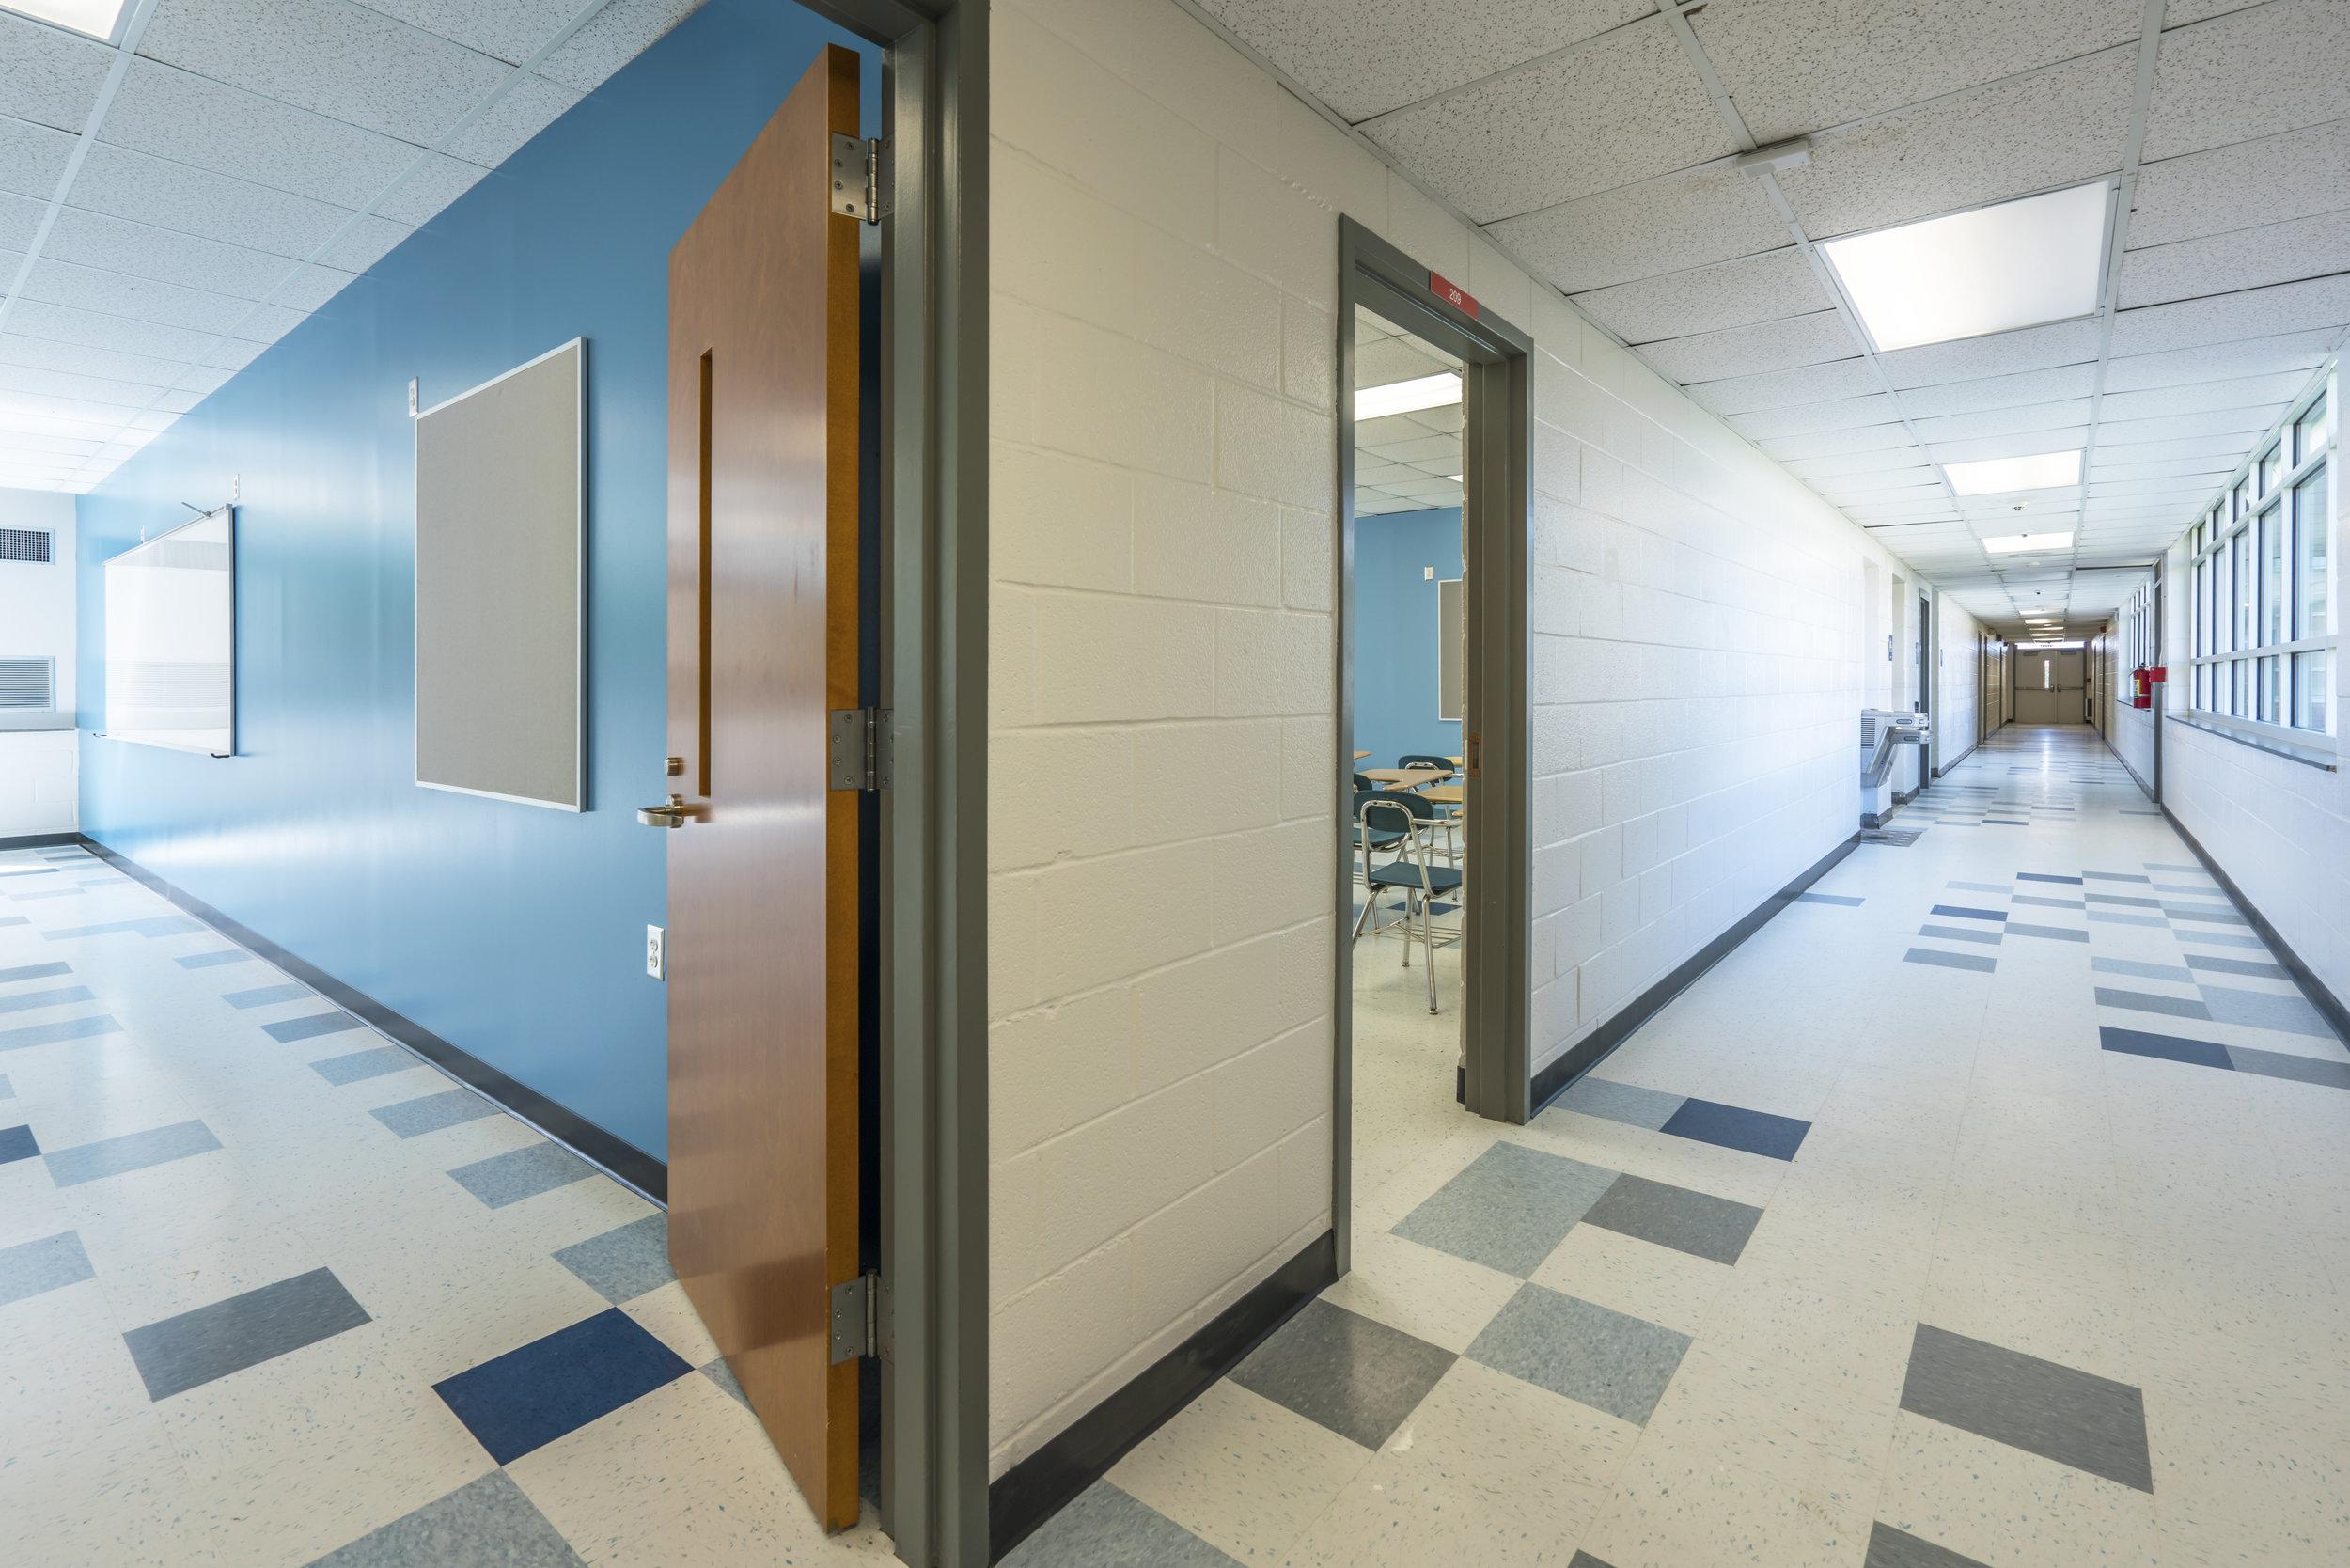 INTERIOR RENOVATIONS |Mills Building - 18,655 SqFt new flooring, wall finishes, doors, marker boards/tack boards, storefront, windows